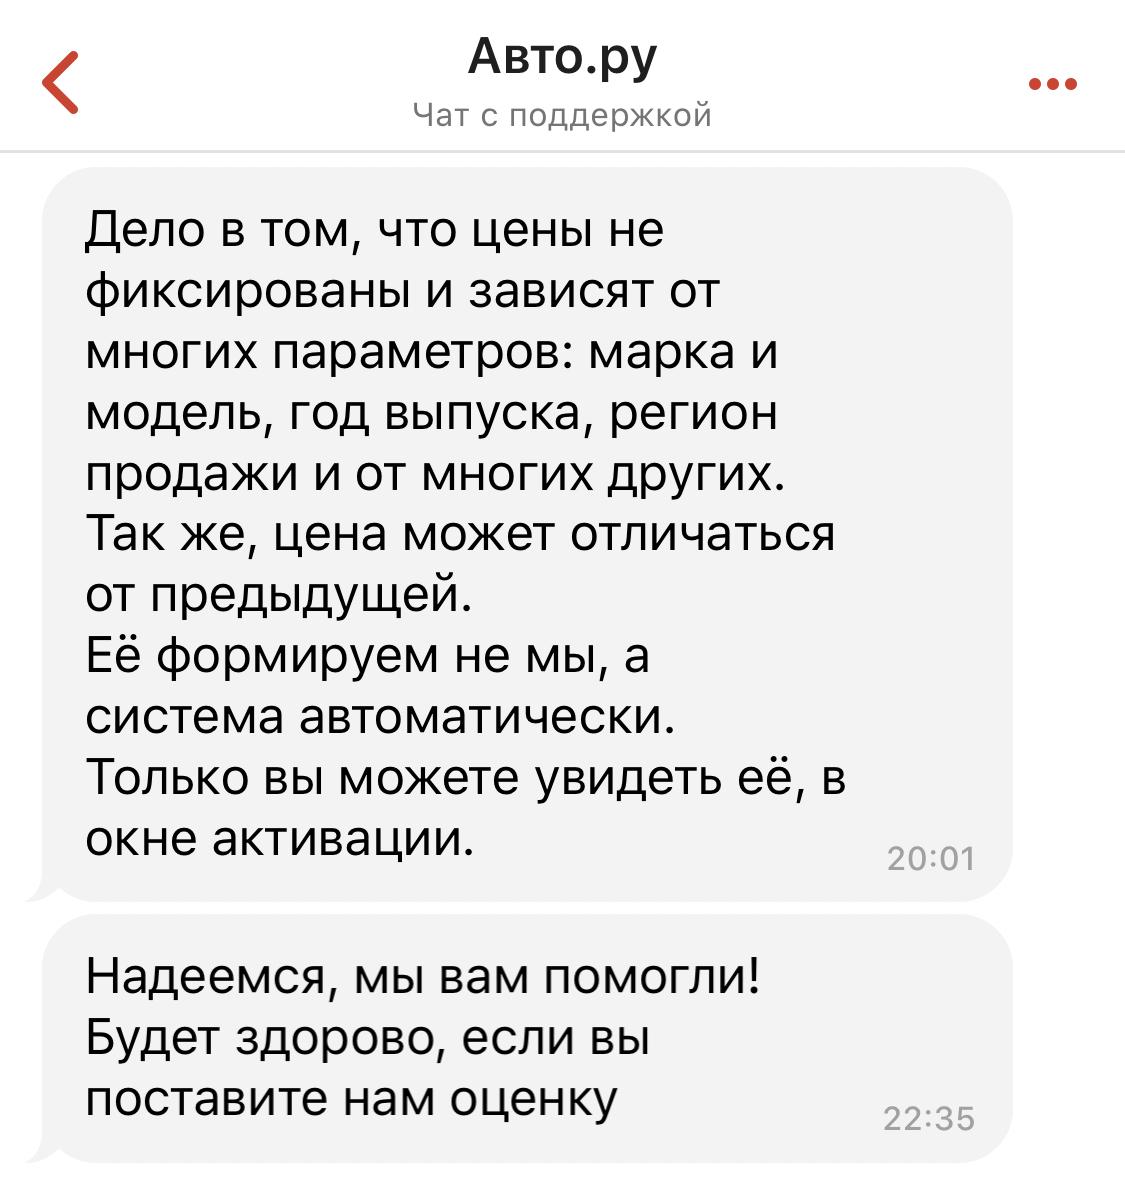 деньги на карту без отказов срочно vsemikrozaymy.ru